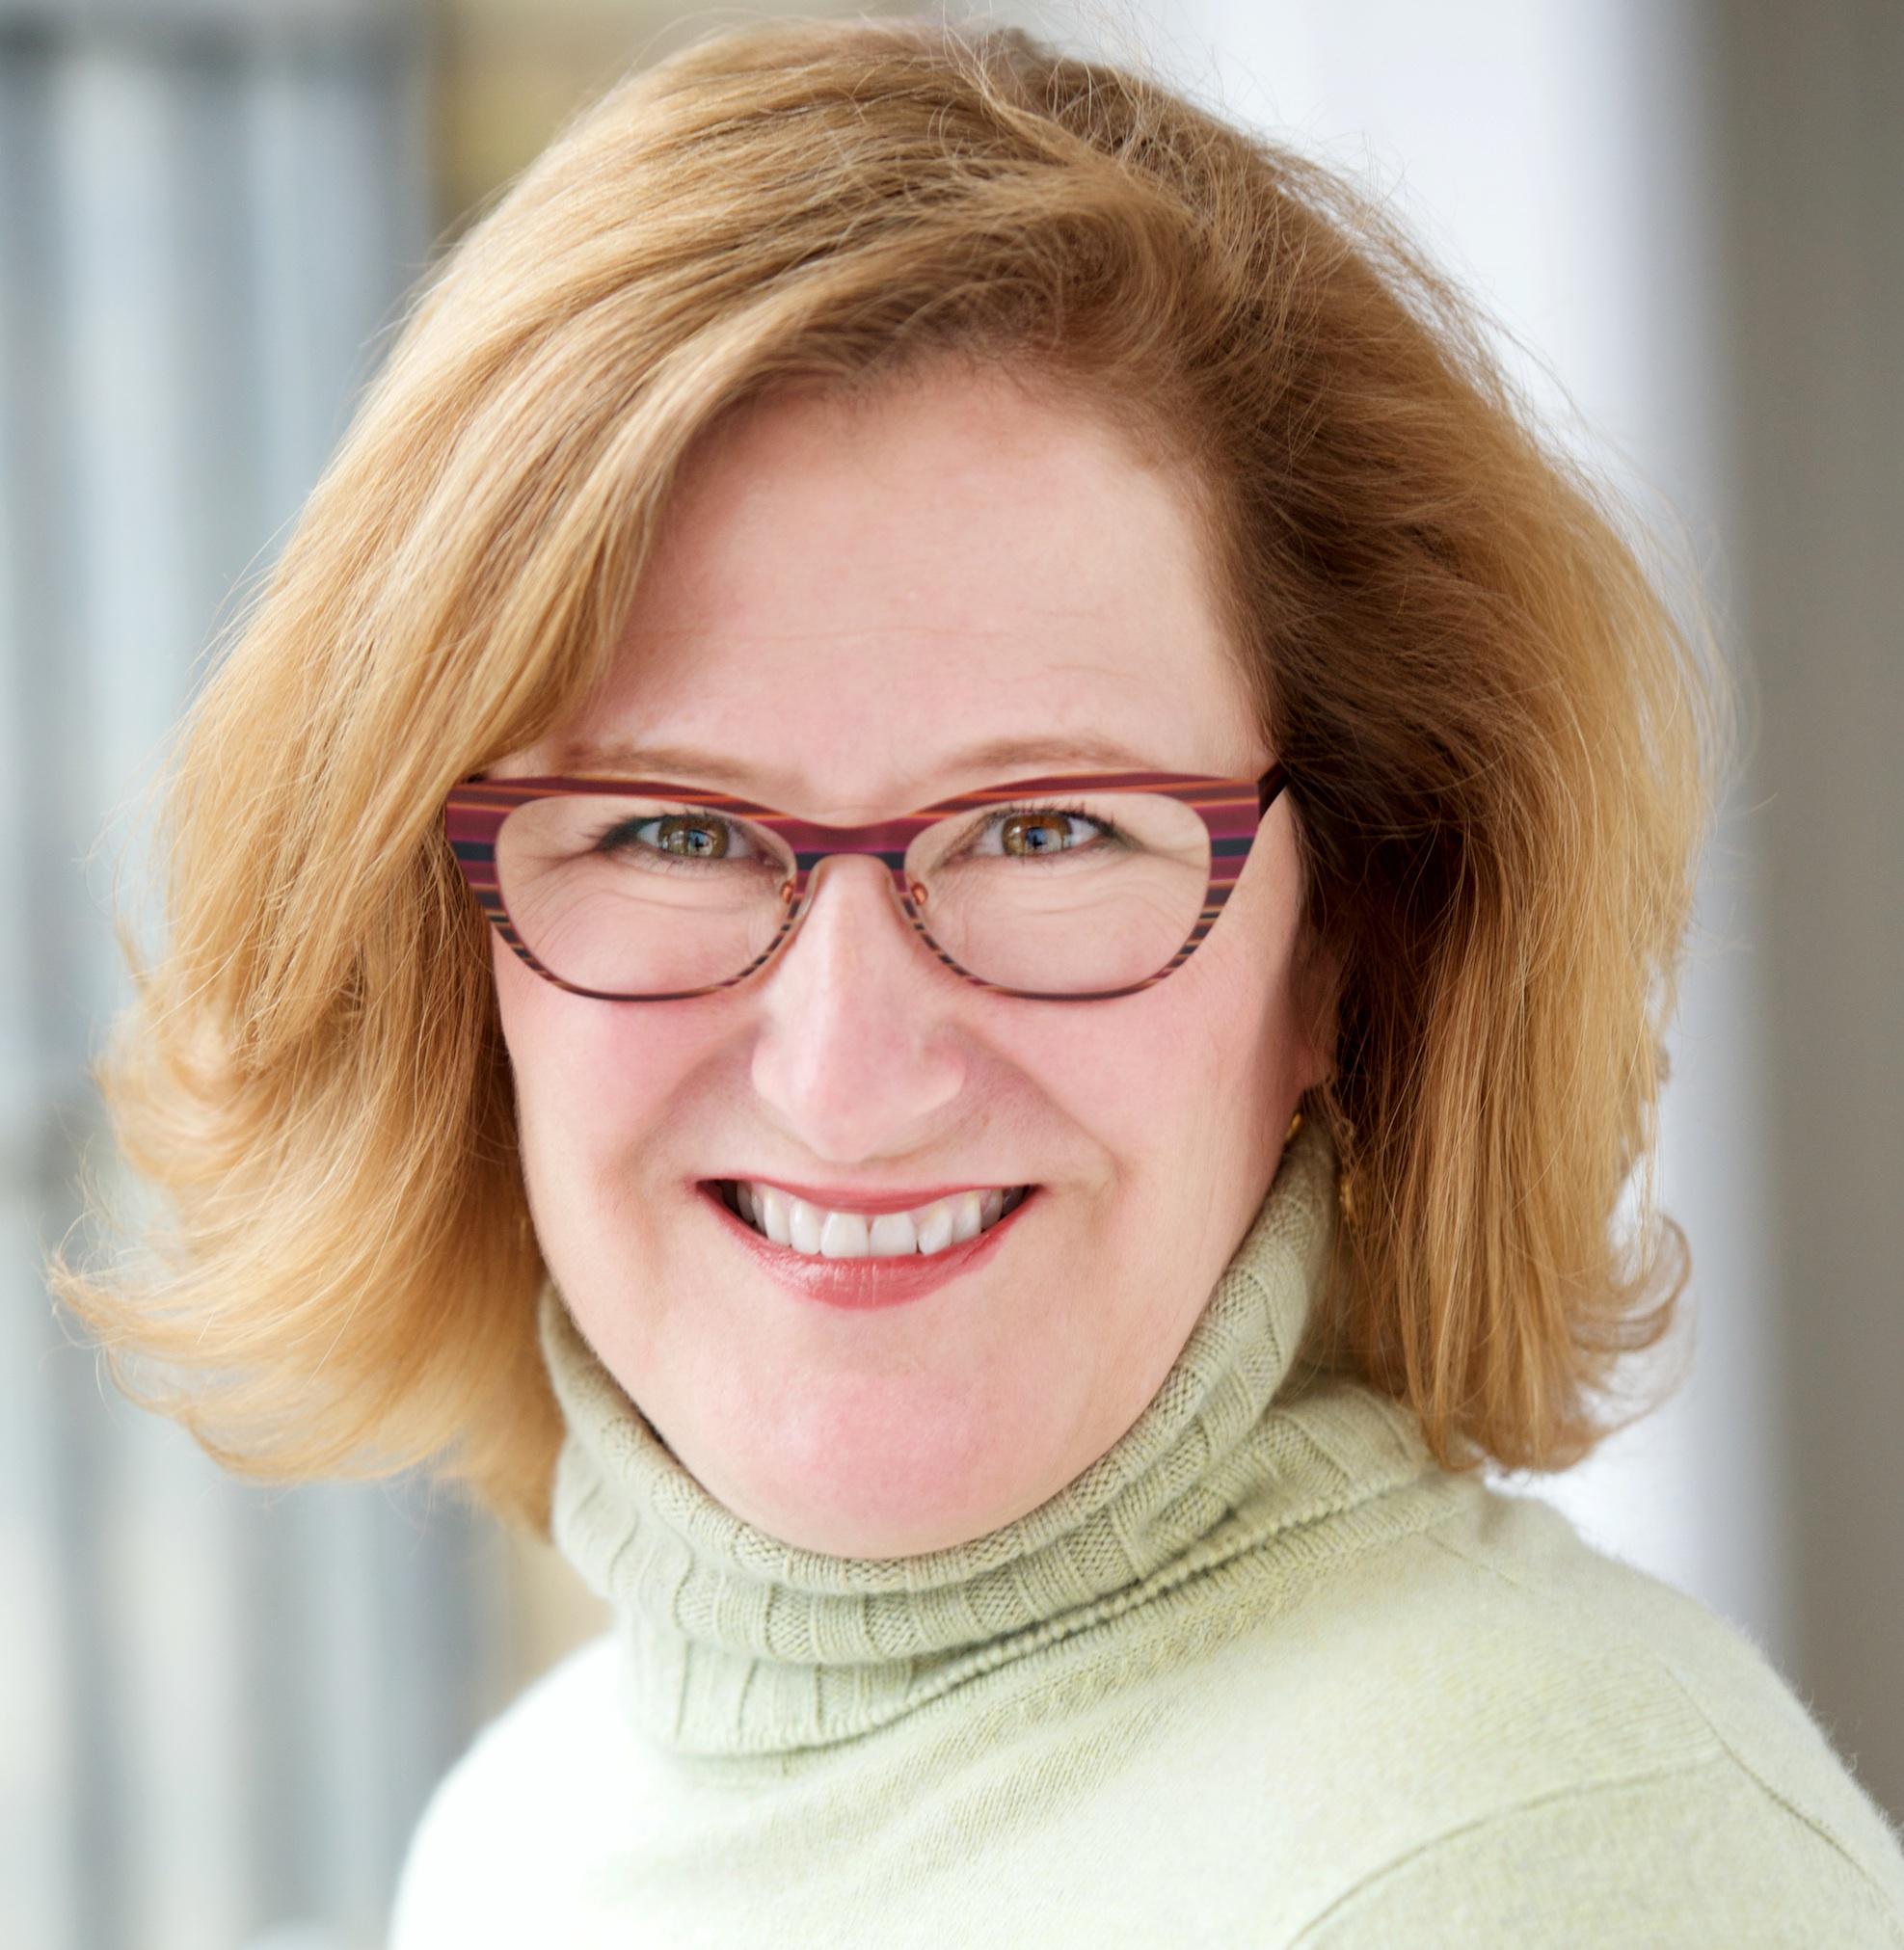 Suzanne Tacheny Kubach, PIE Network